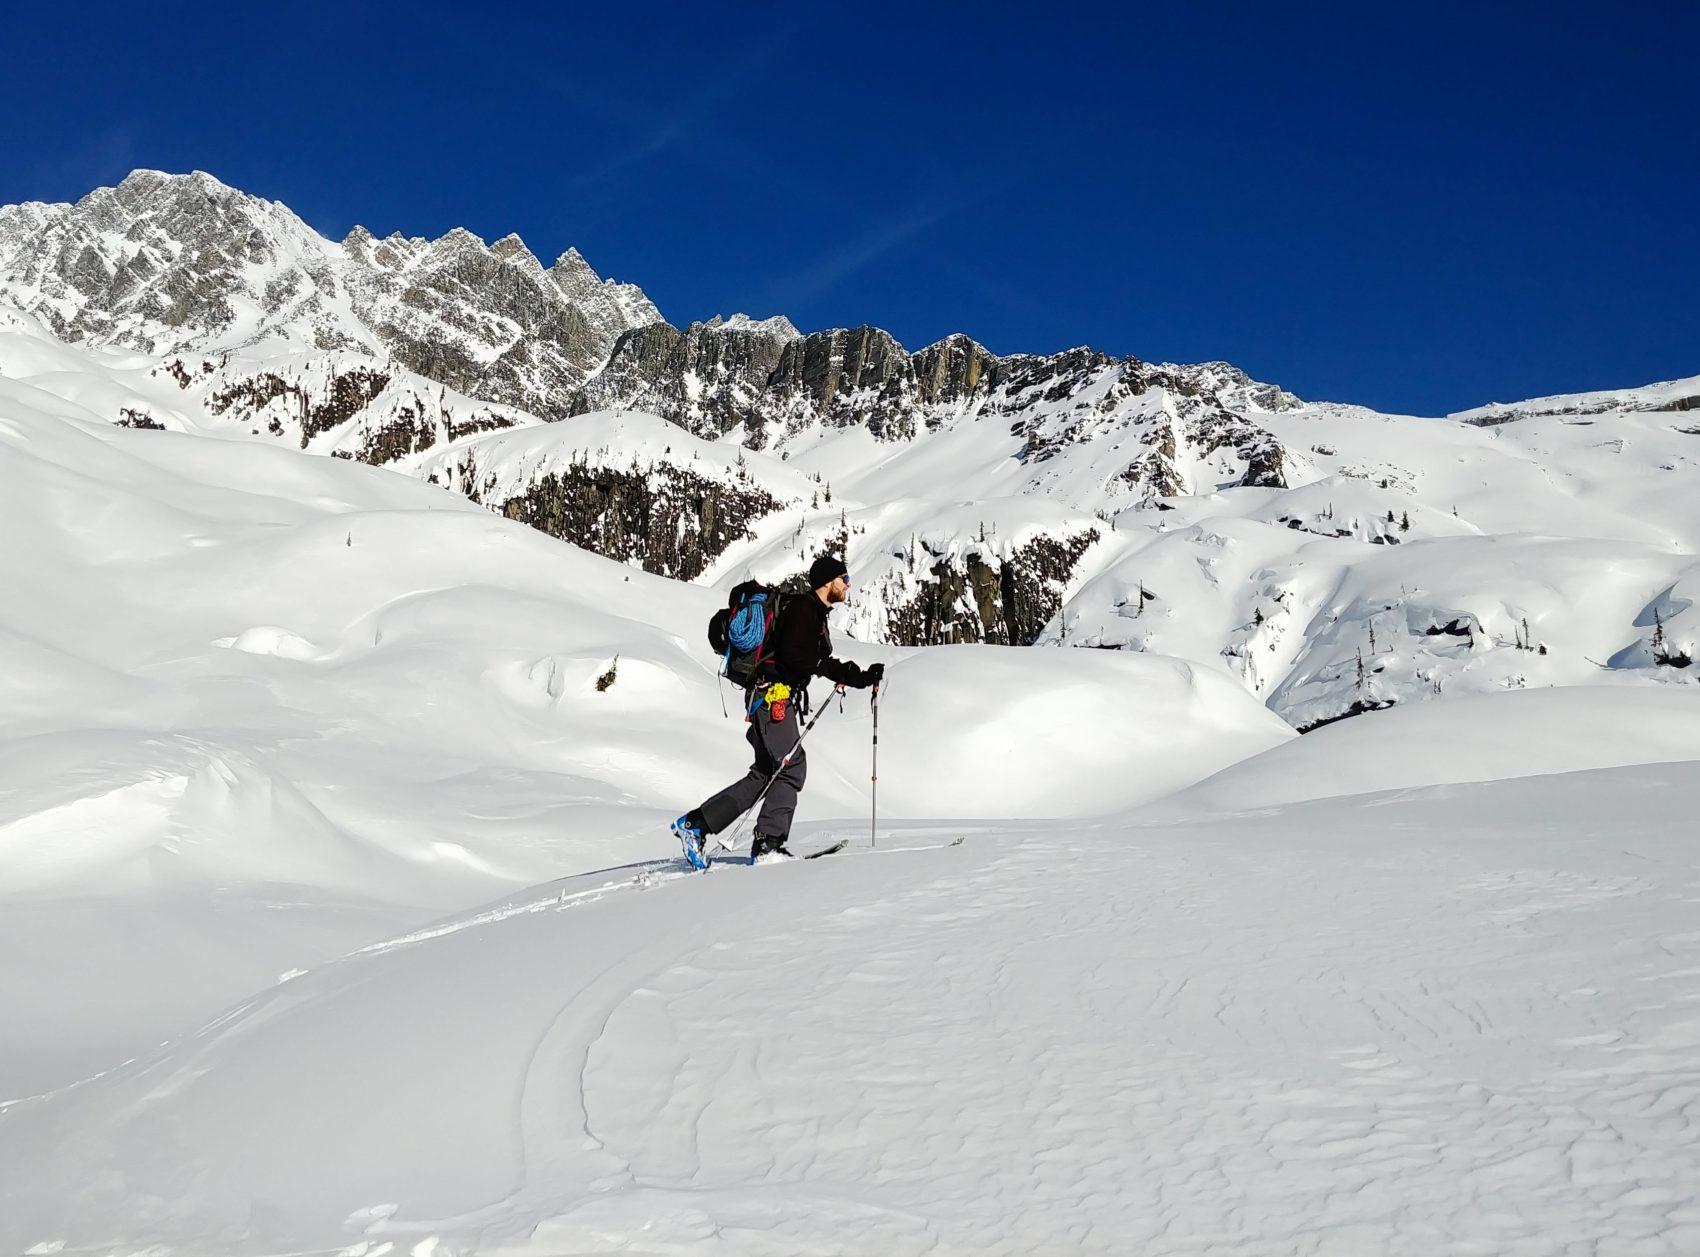 skier with glacier travel gear